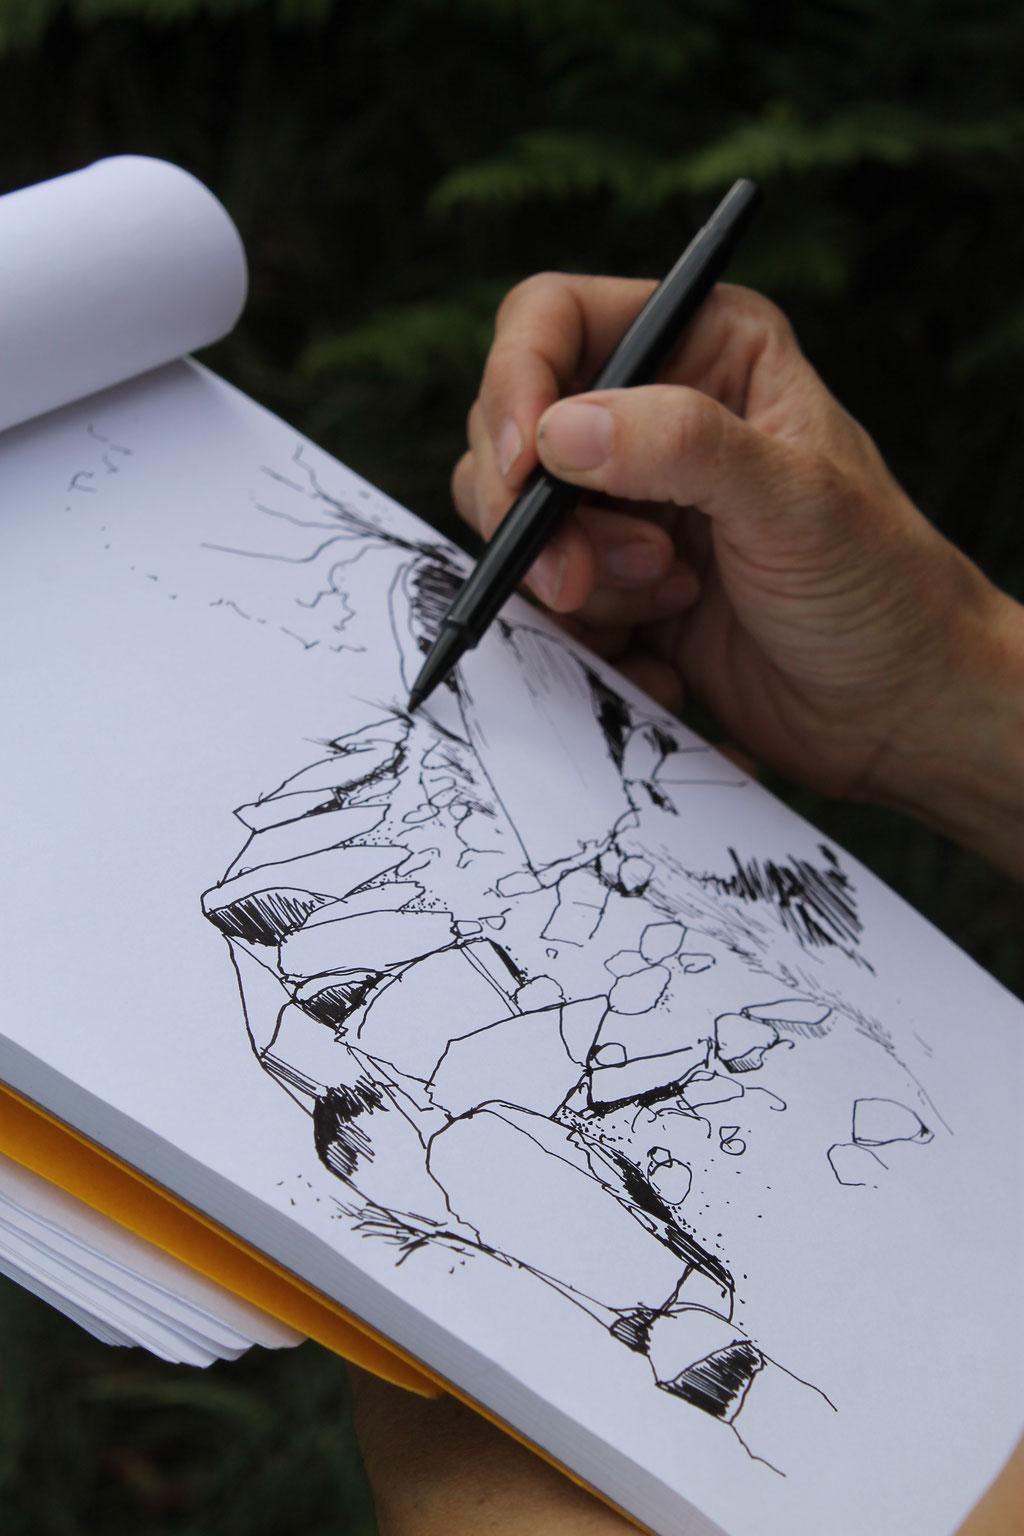 crédit photo ELIPS/dessin Far Paysage